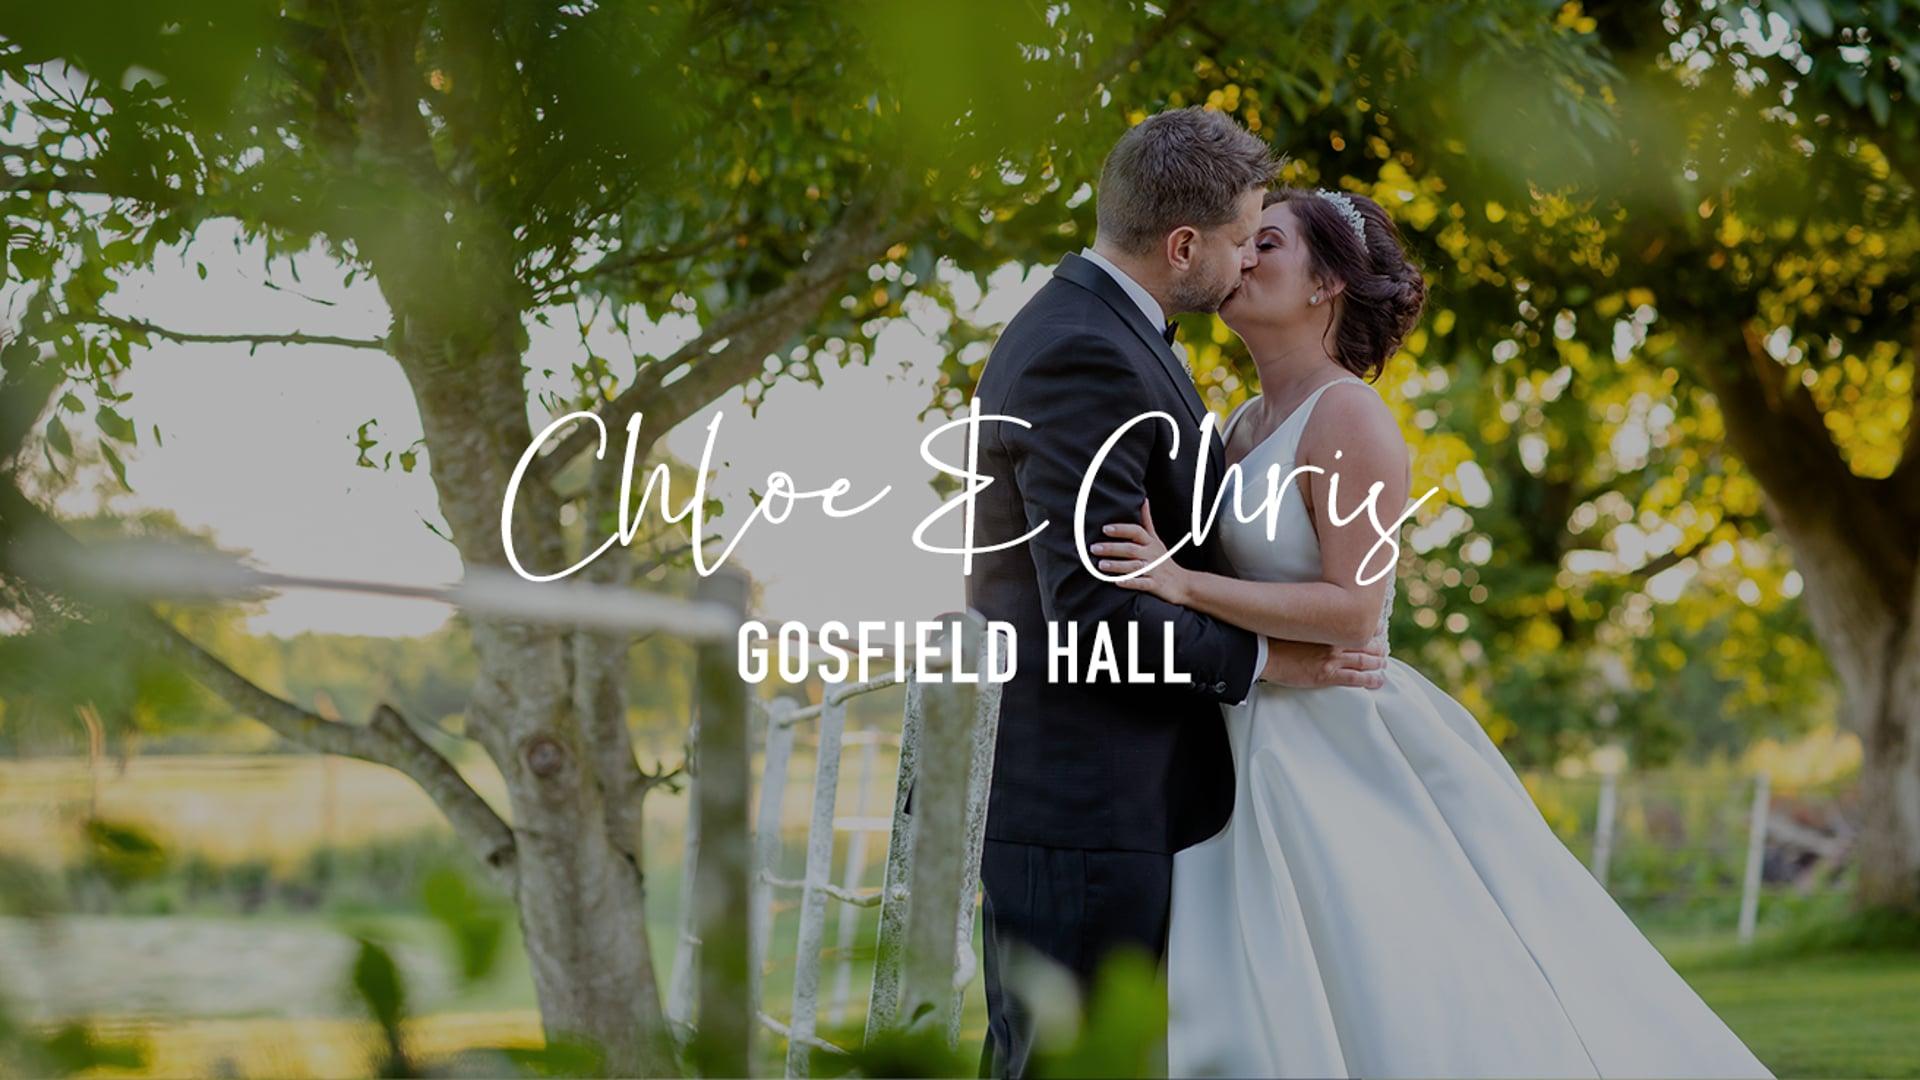 Chloe & Chris - Gosfield Hall